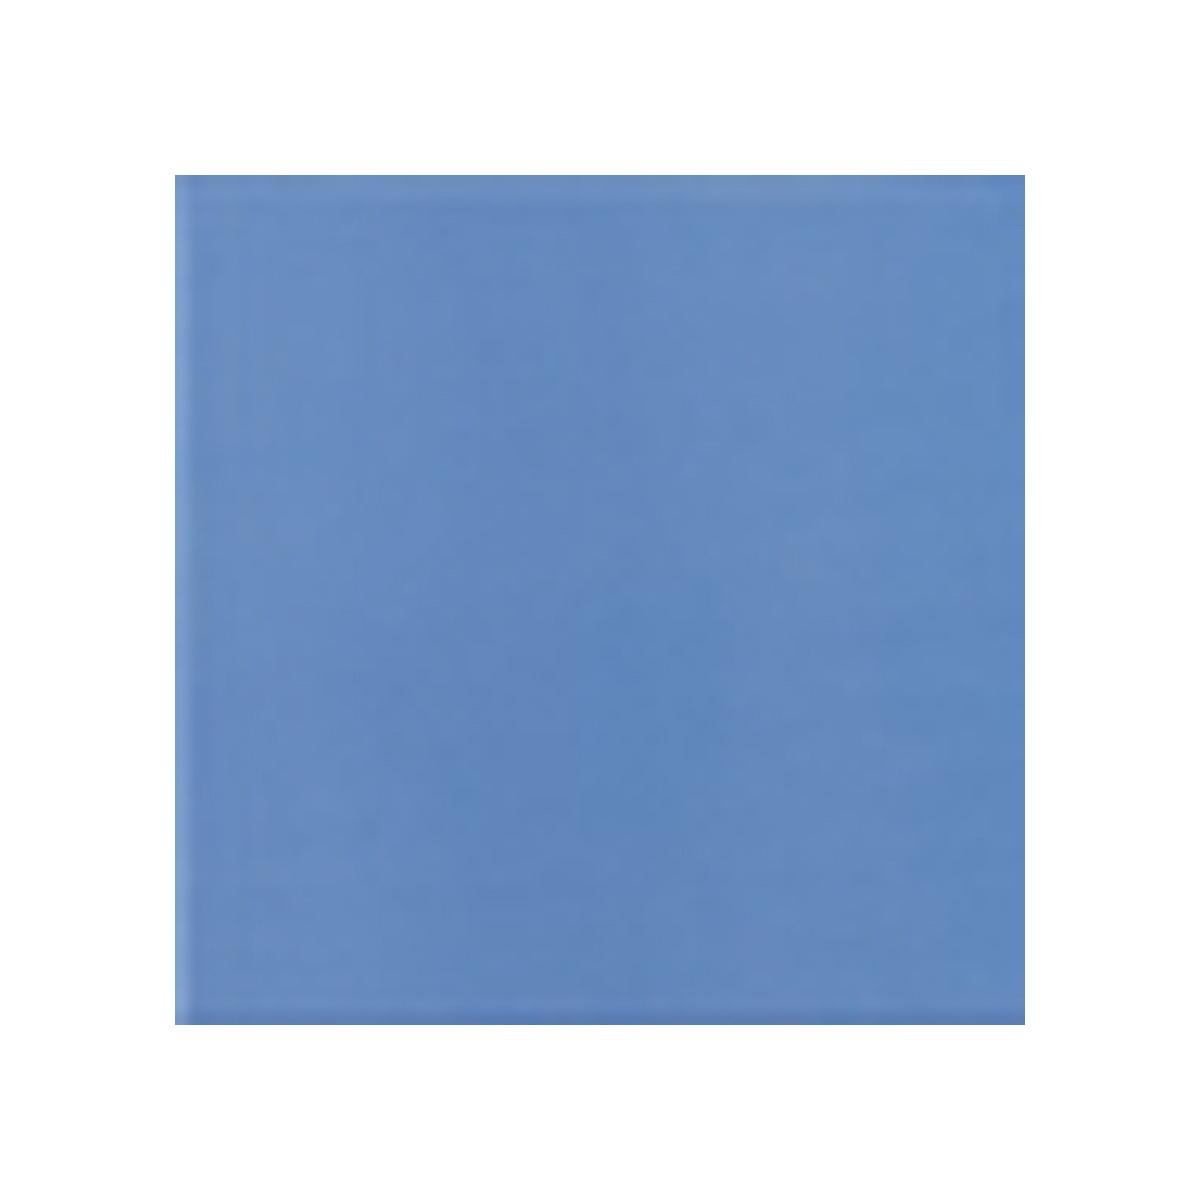 Color azul claro mate - Colección Colores Mate - Marca Mainzu